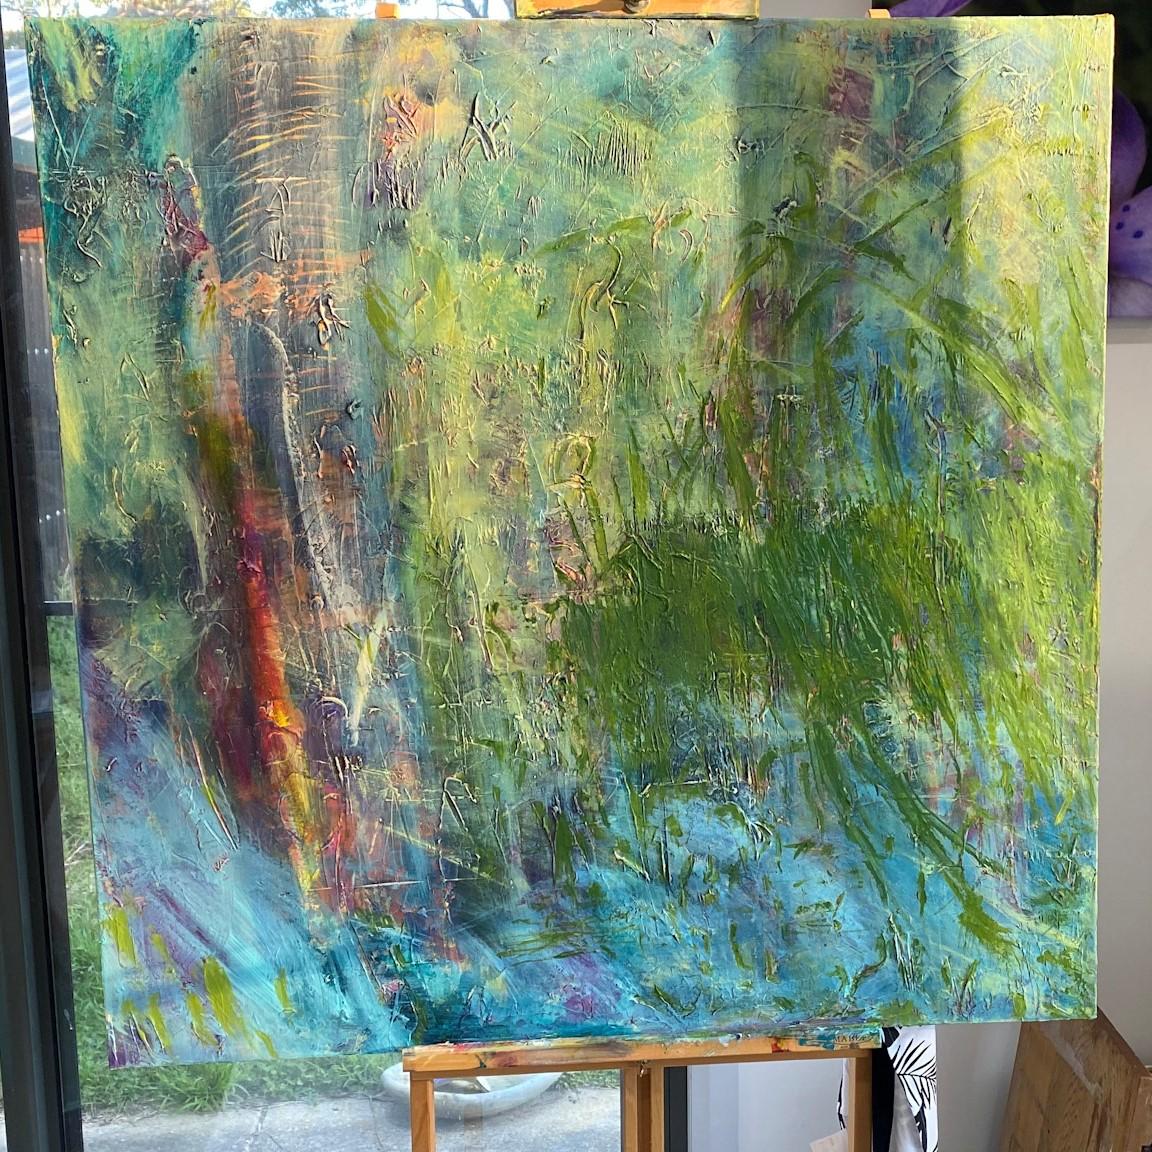 Work in progress - Layer 4-'Trunks' by Lisa G Hunter